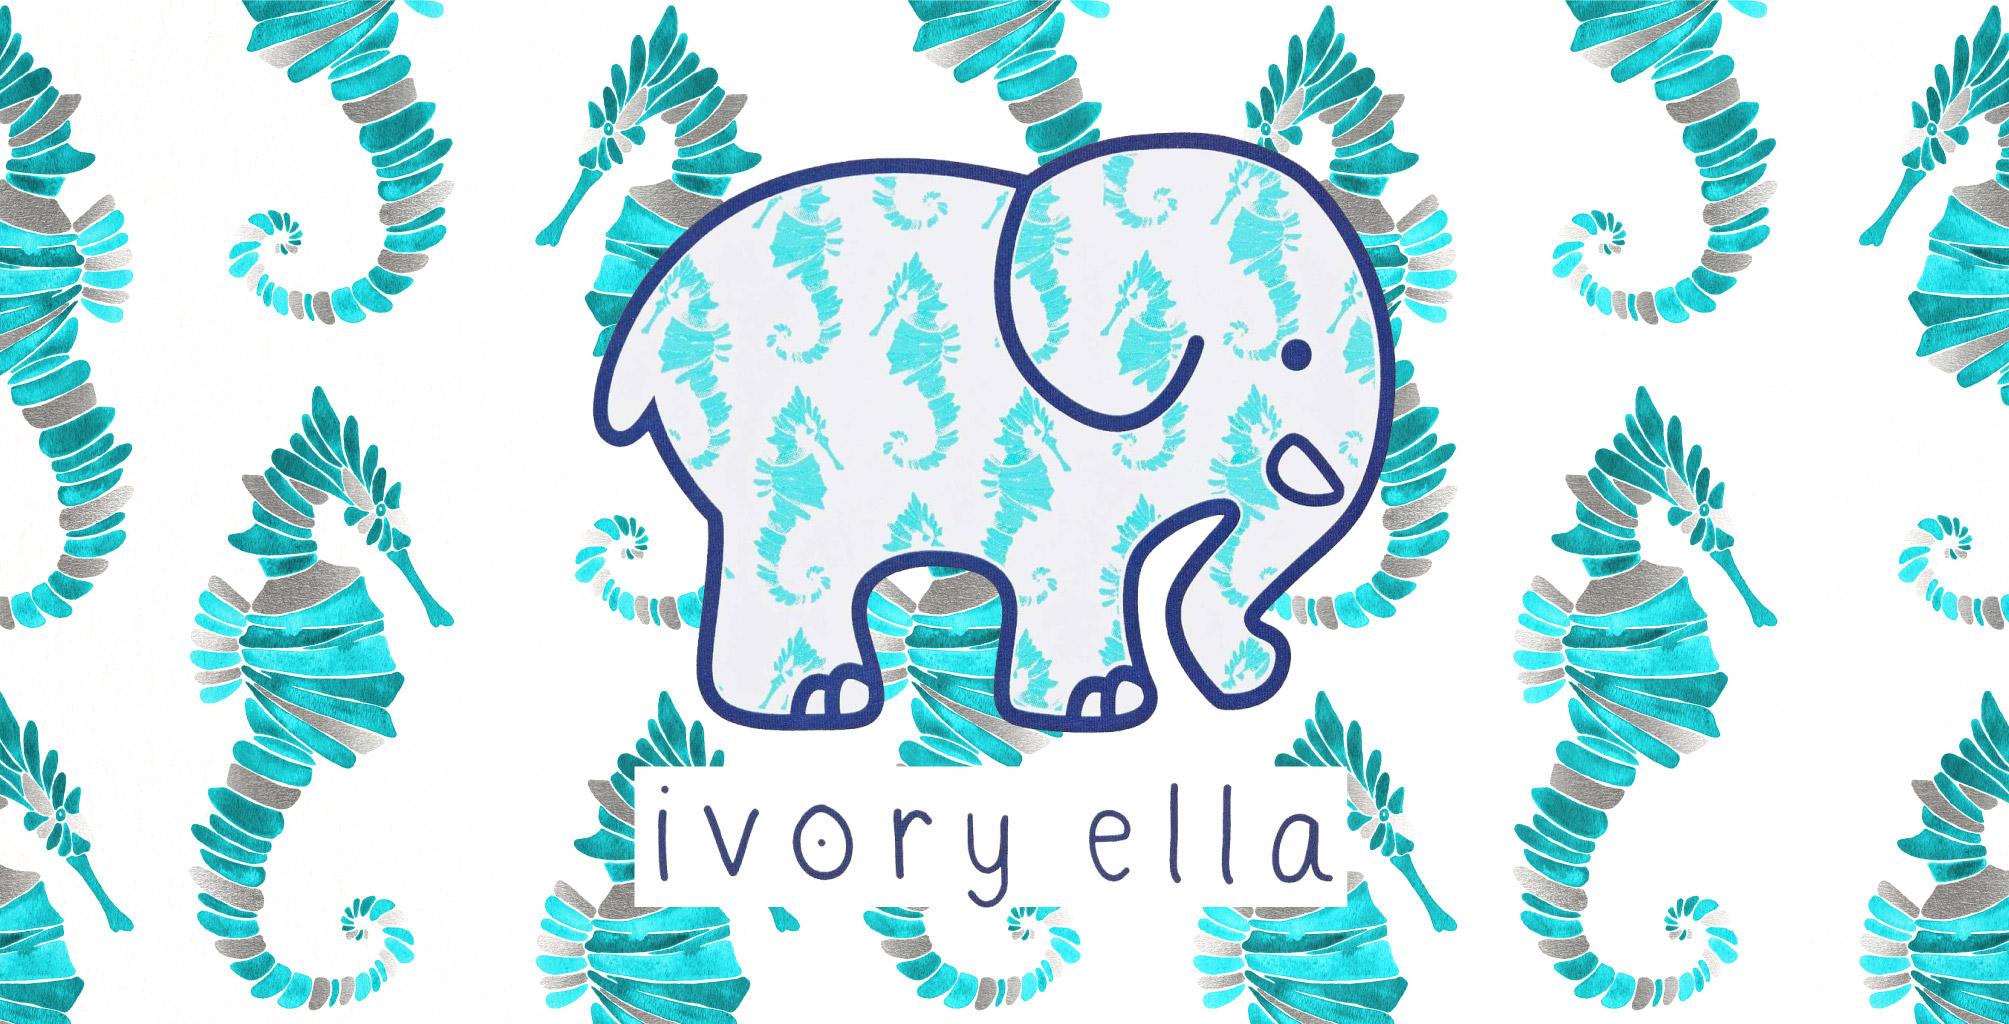 IvoryElla-Seahorse.jpg